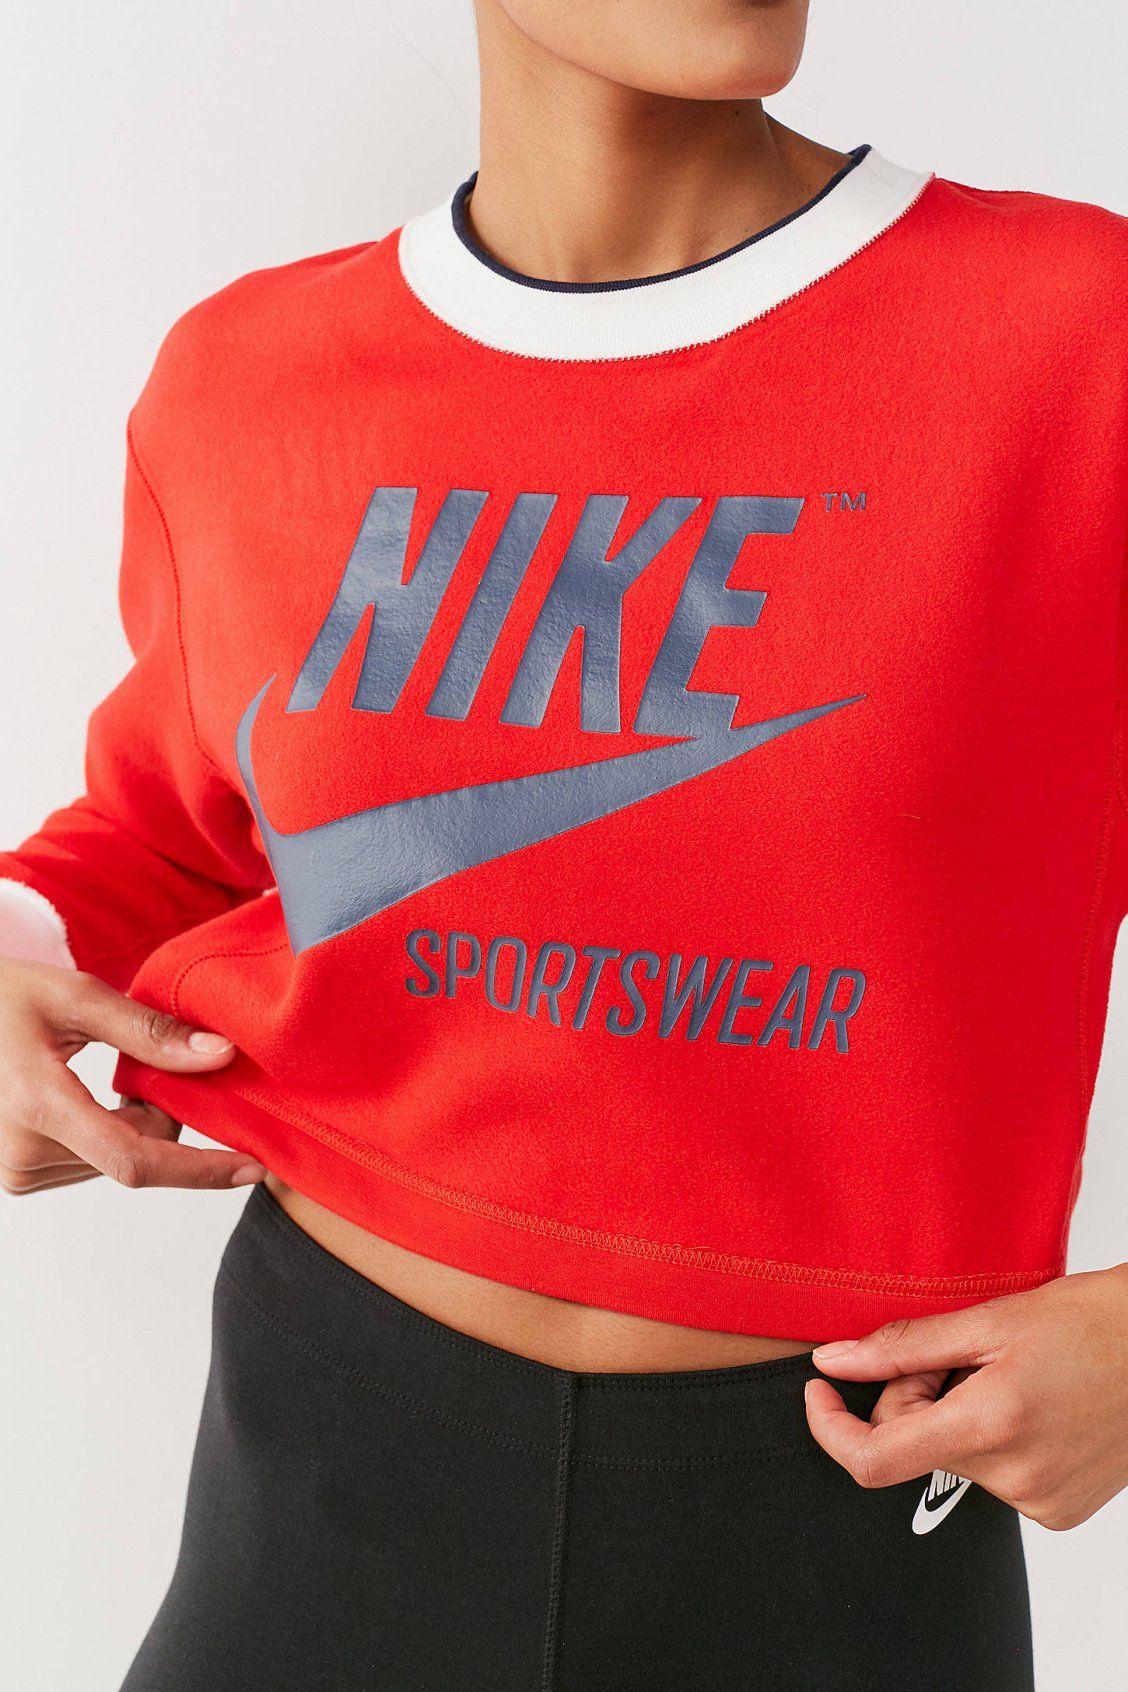 Predownload: Nike Sportswear Reversible Cropped Sweatshirt Sportswear Crop Sweatshirt Sweatshirts [ 1692 x 1128 Pixel ]